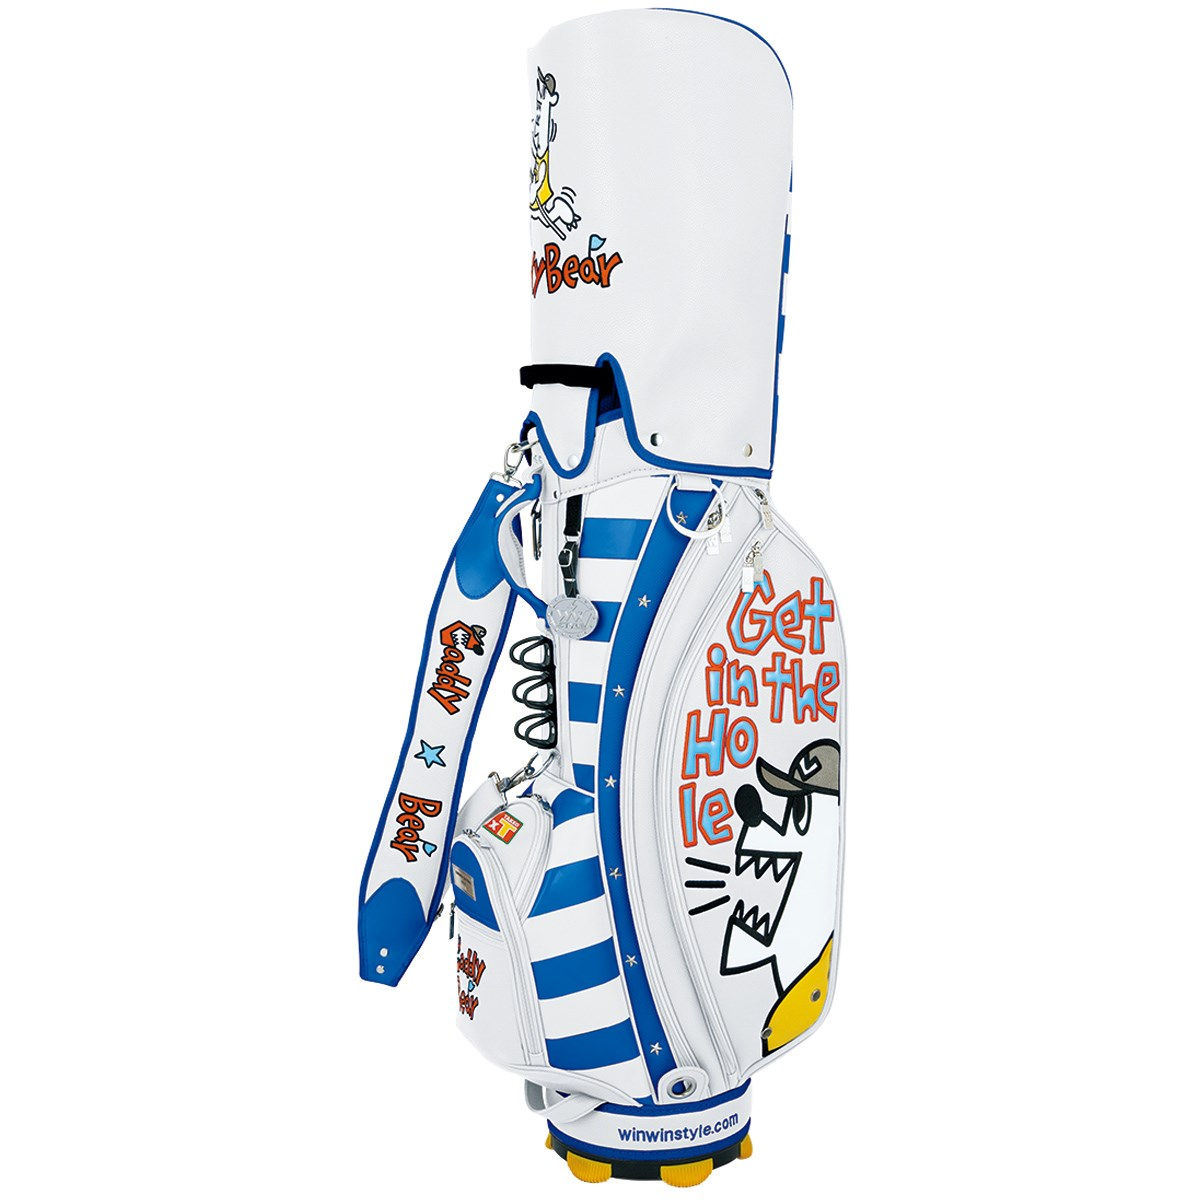 WINWIN STYLE WINWINSTYLE×野村タケオ コラボレーション キャディバッグ